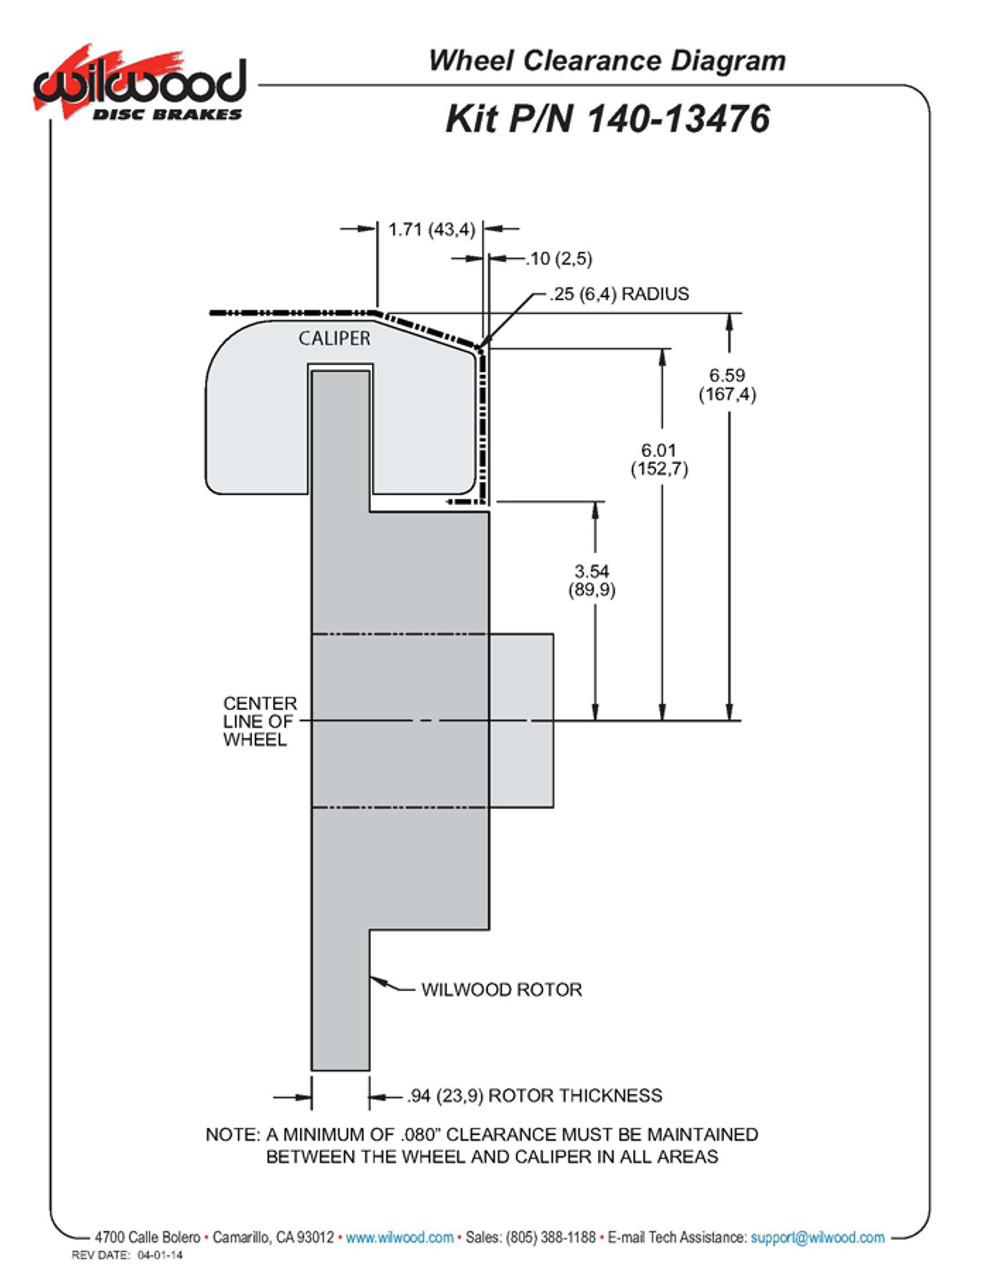 Wilwood wheel clearance diagram.  1964-1969